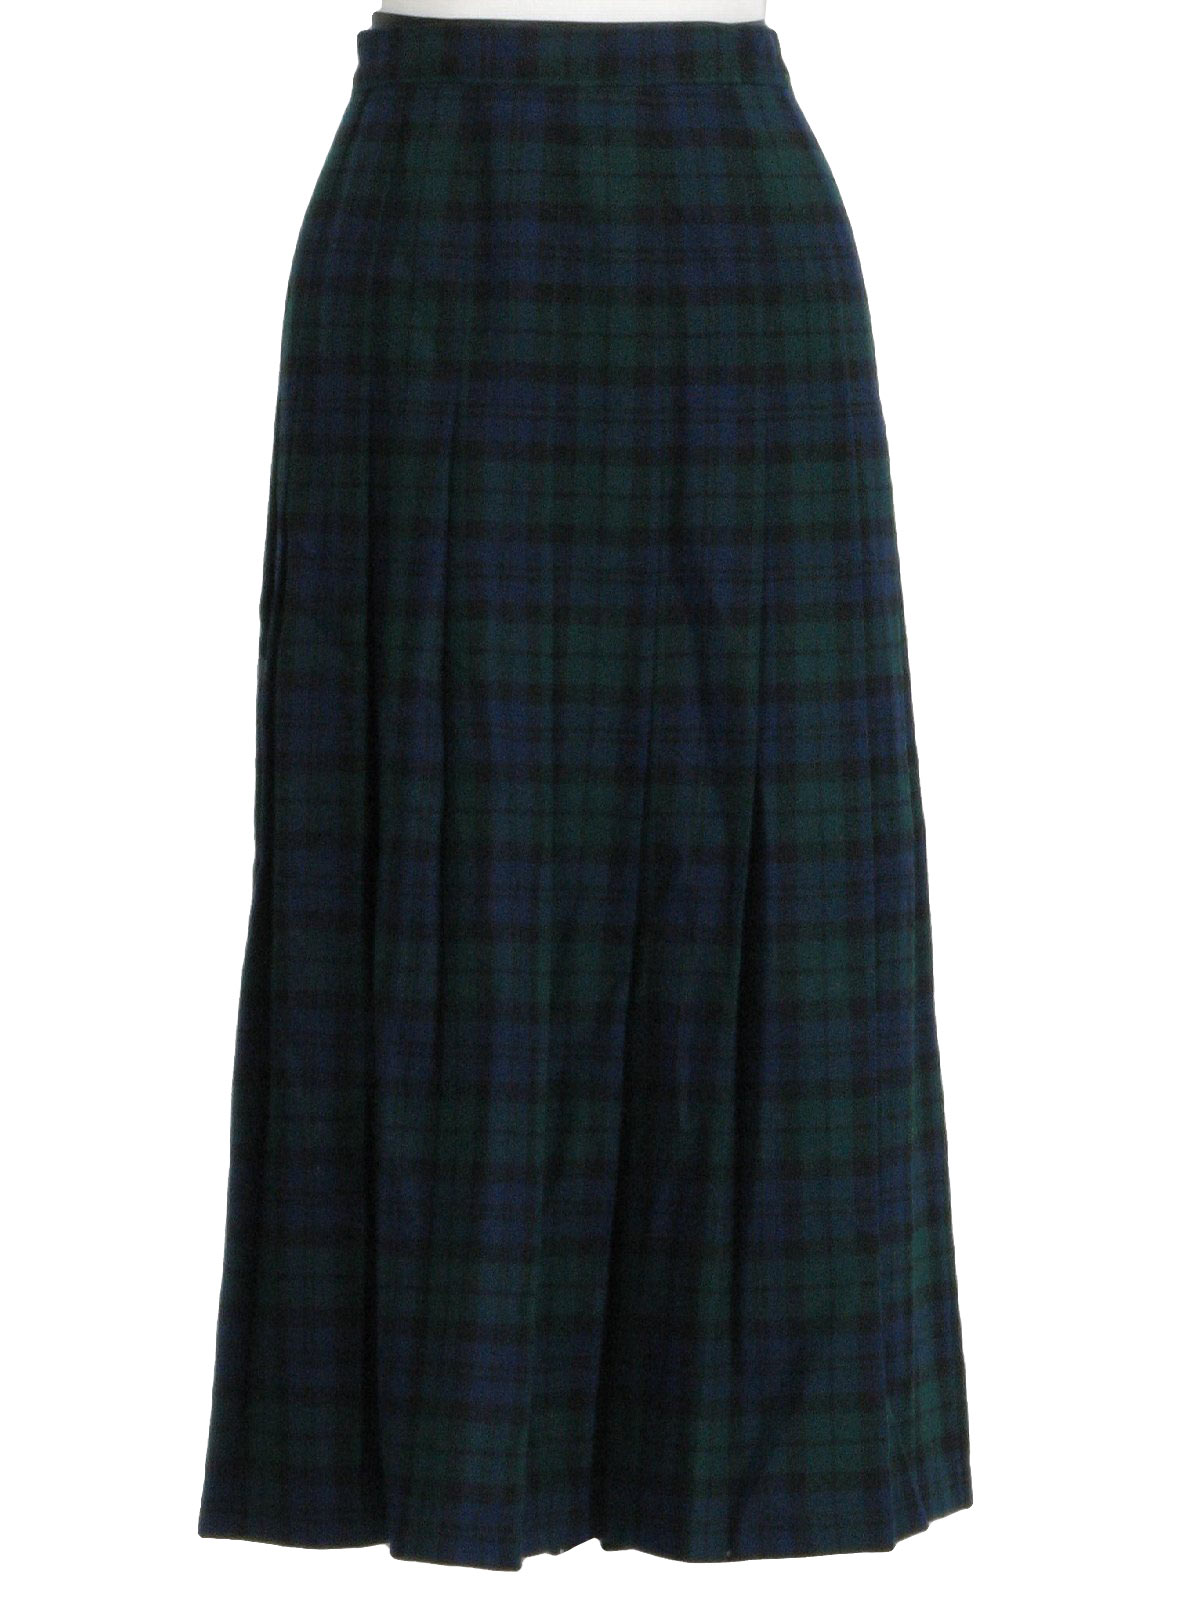 b96984b0b 70's Pendleton Plaid Skirt: 70s -Pendleton- Womens dark blue, black and  green thick pleated shin length, high waist -Blackwatch- tartan print wool  skirt ...